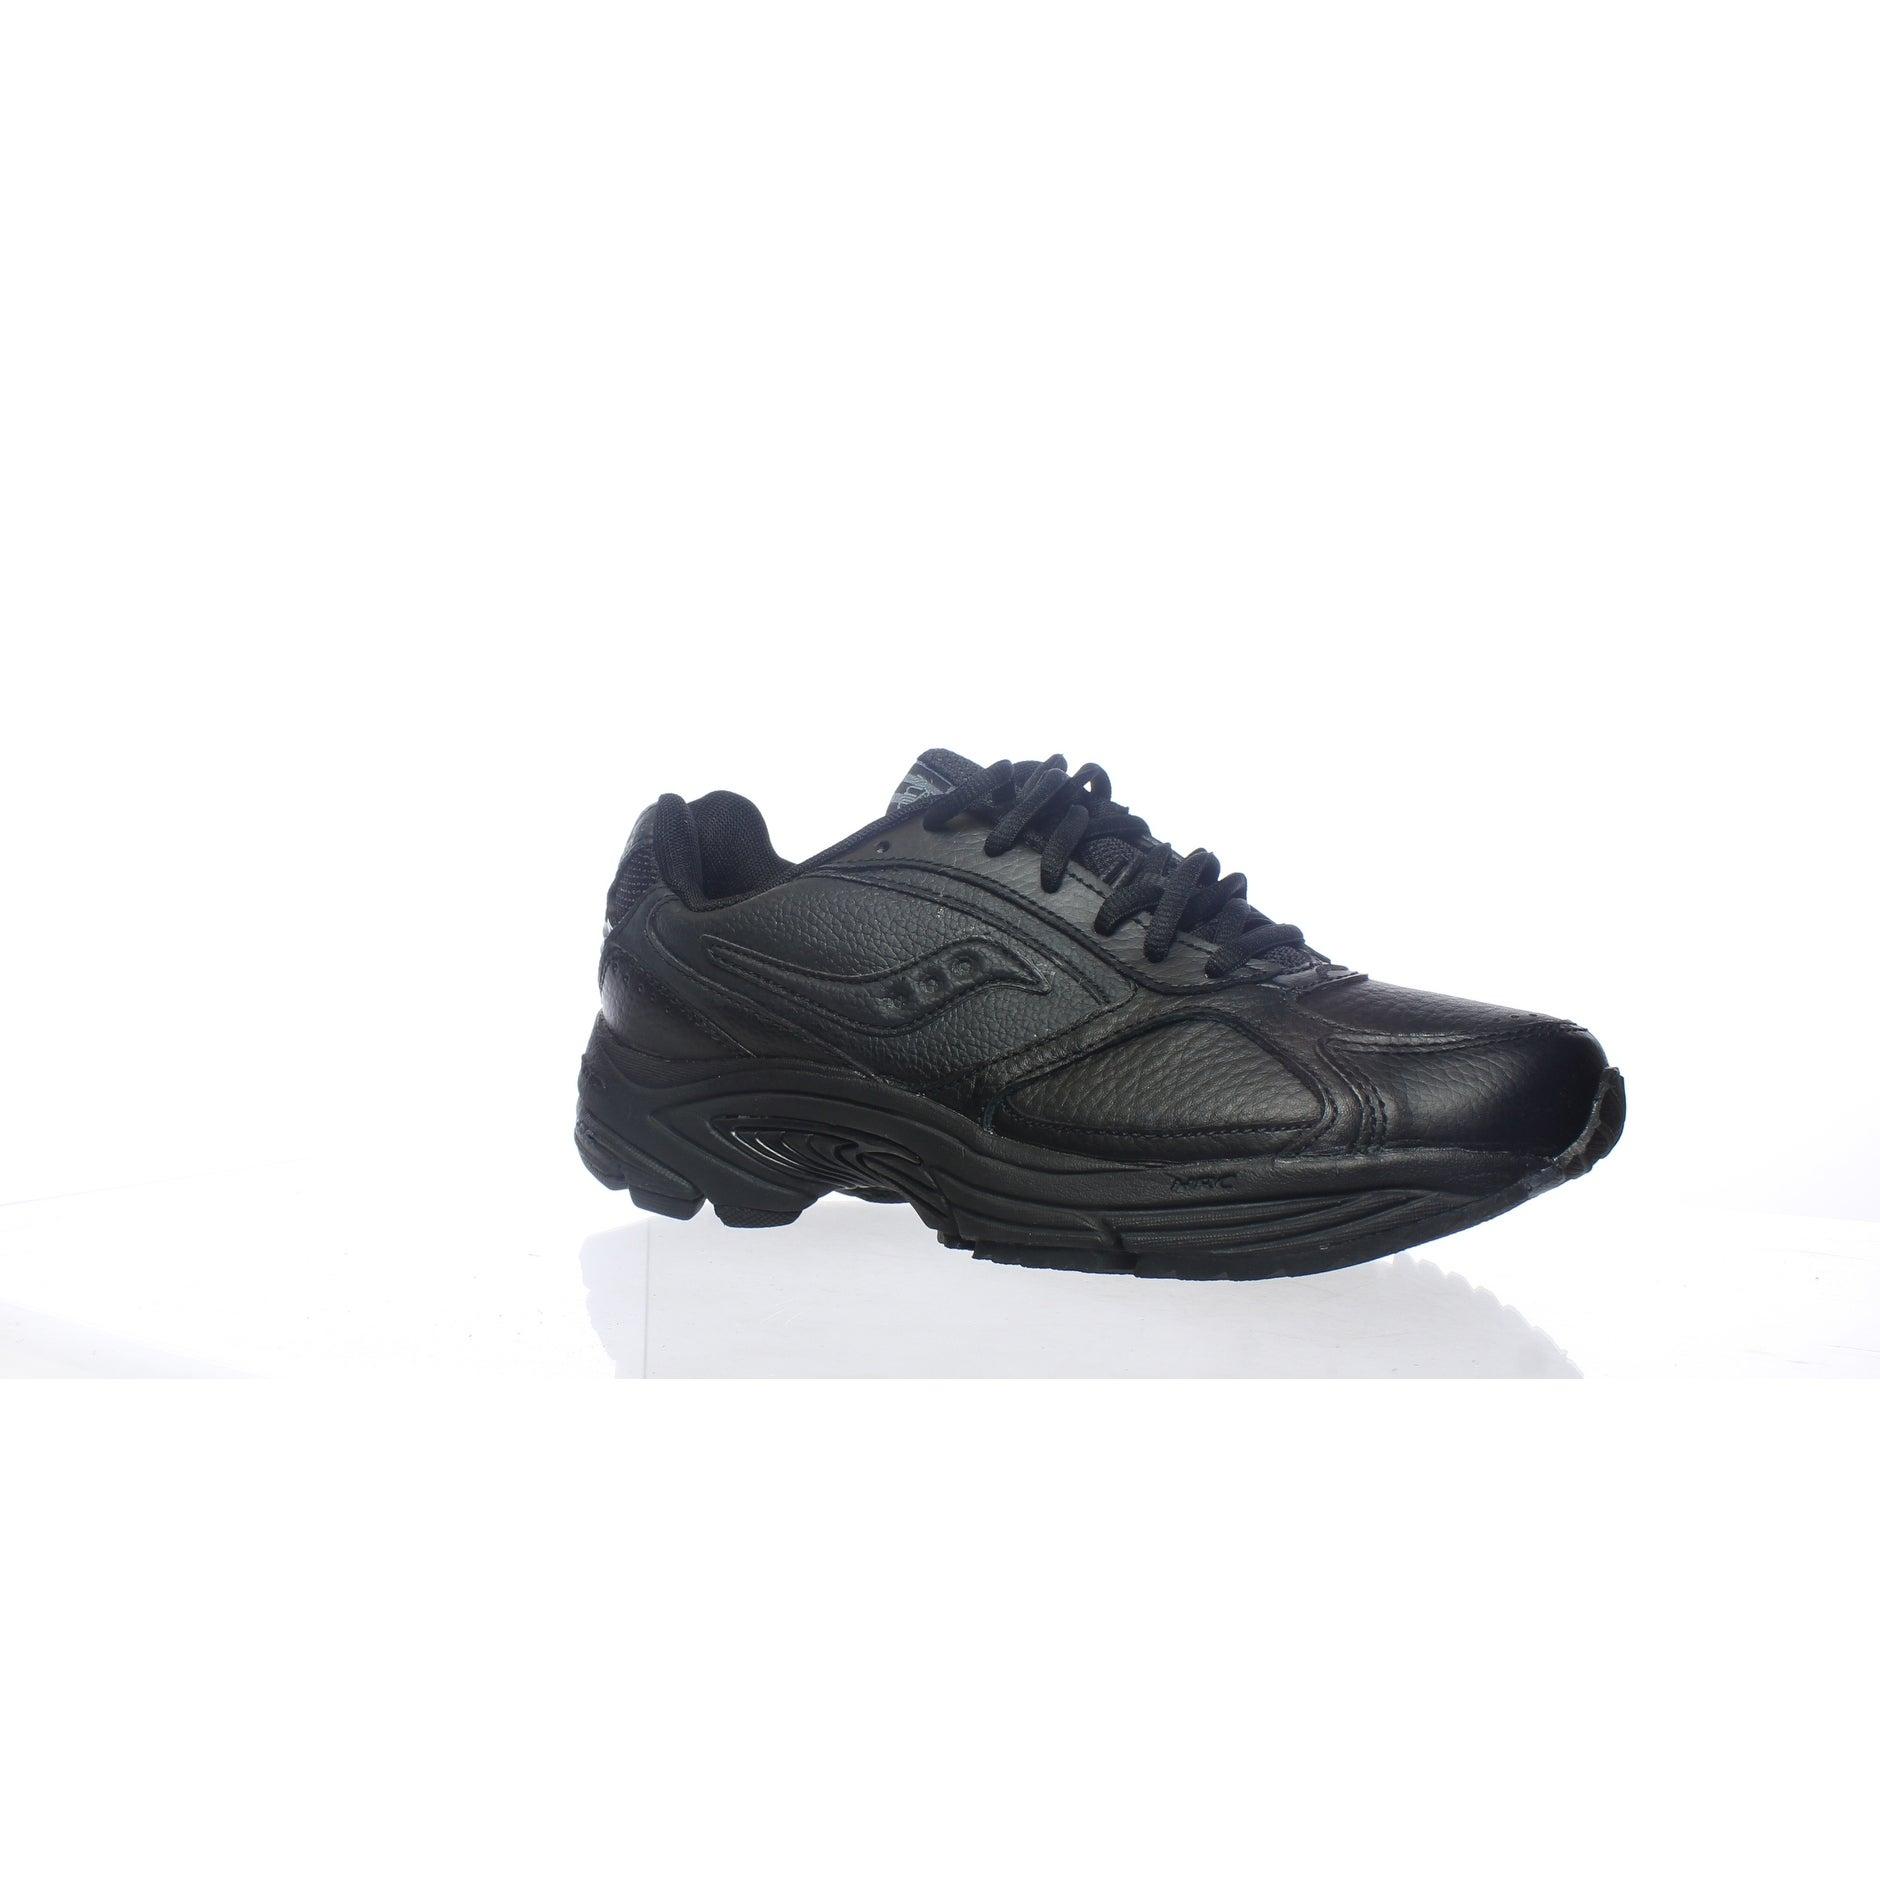 15a23d34 Saucony Shoes | Shop our Best Clothing & Shoes Deals Online at Overstock